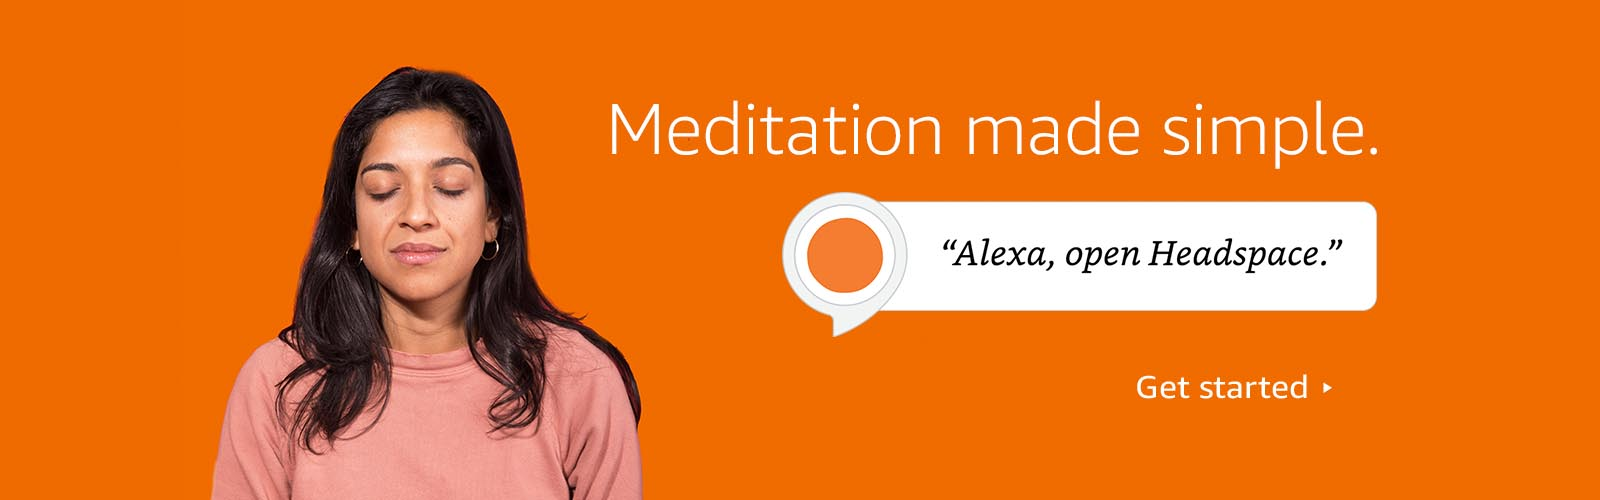 Alexa, open Headspace